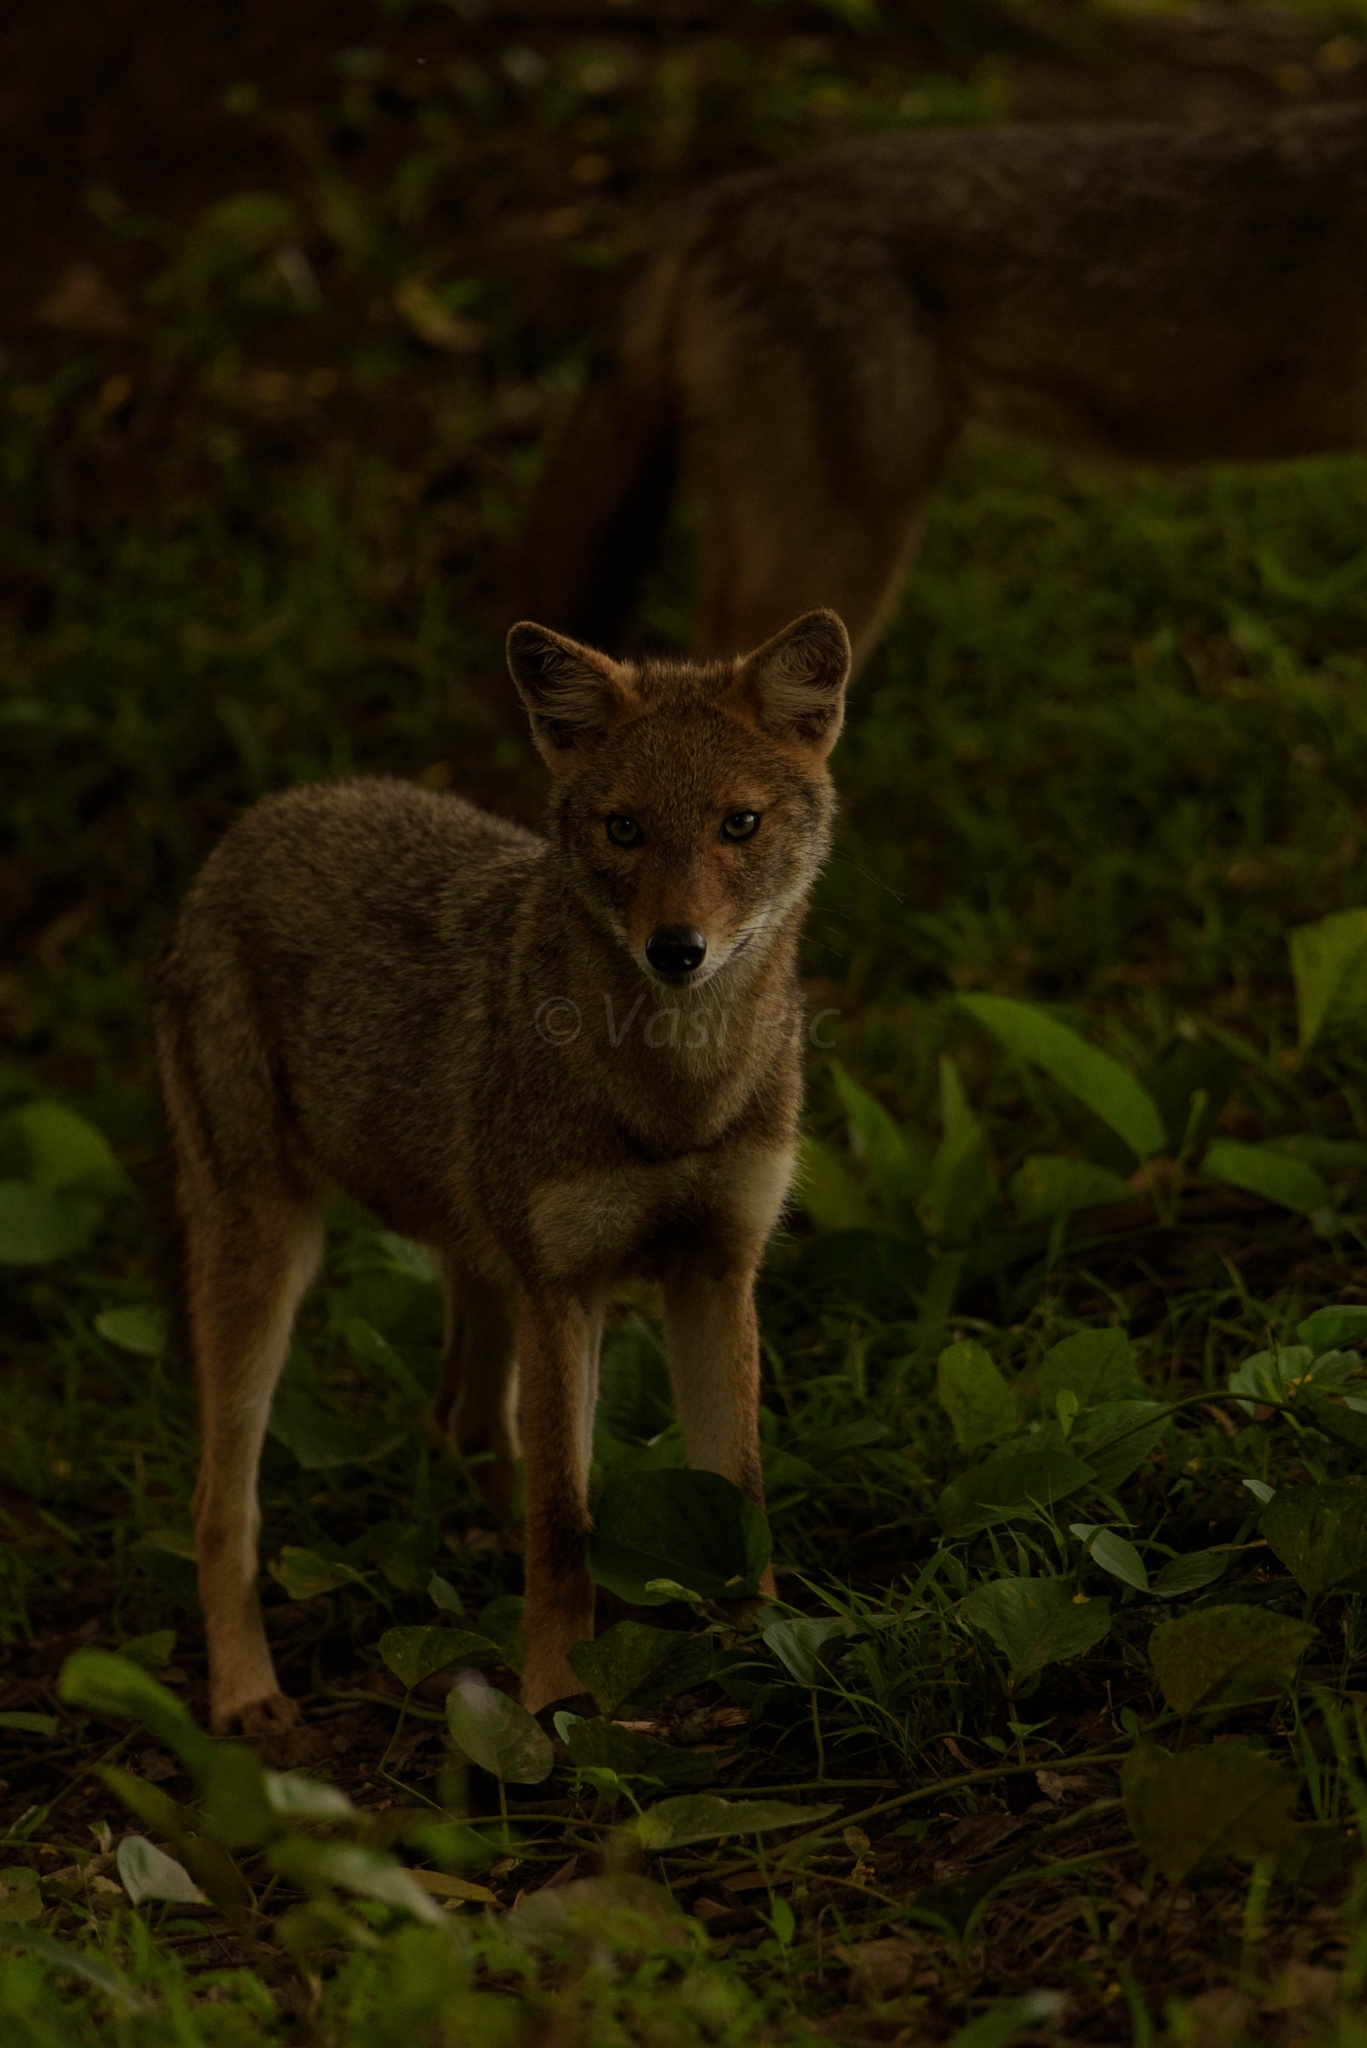 Indian jackal by vasi23